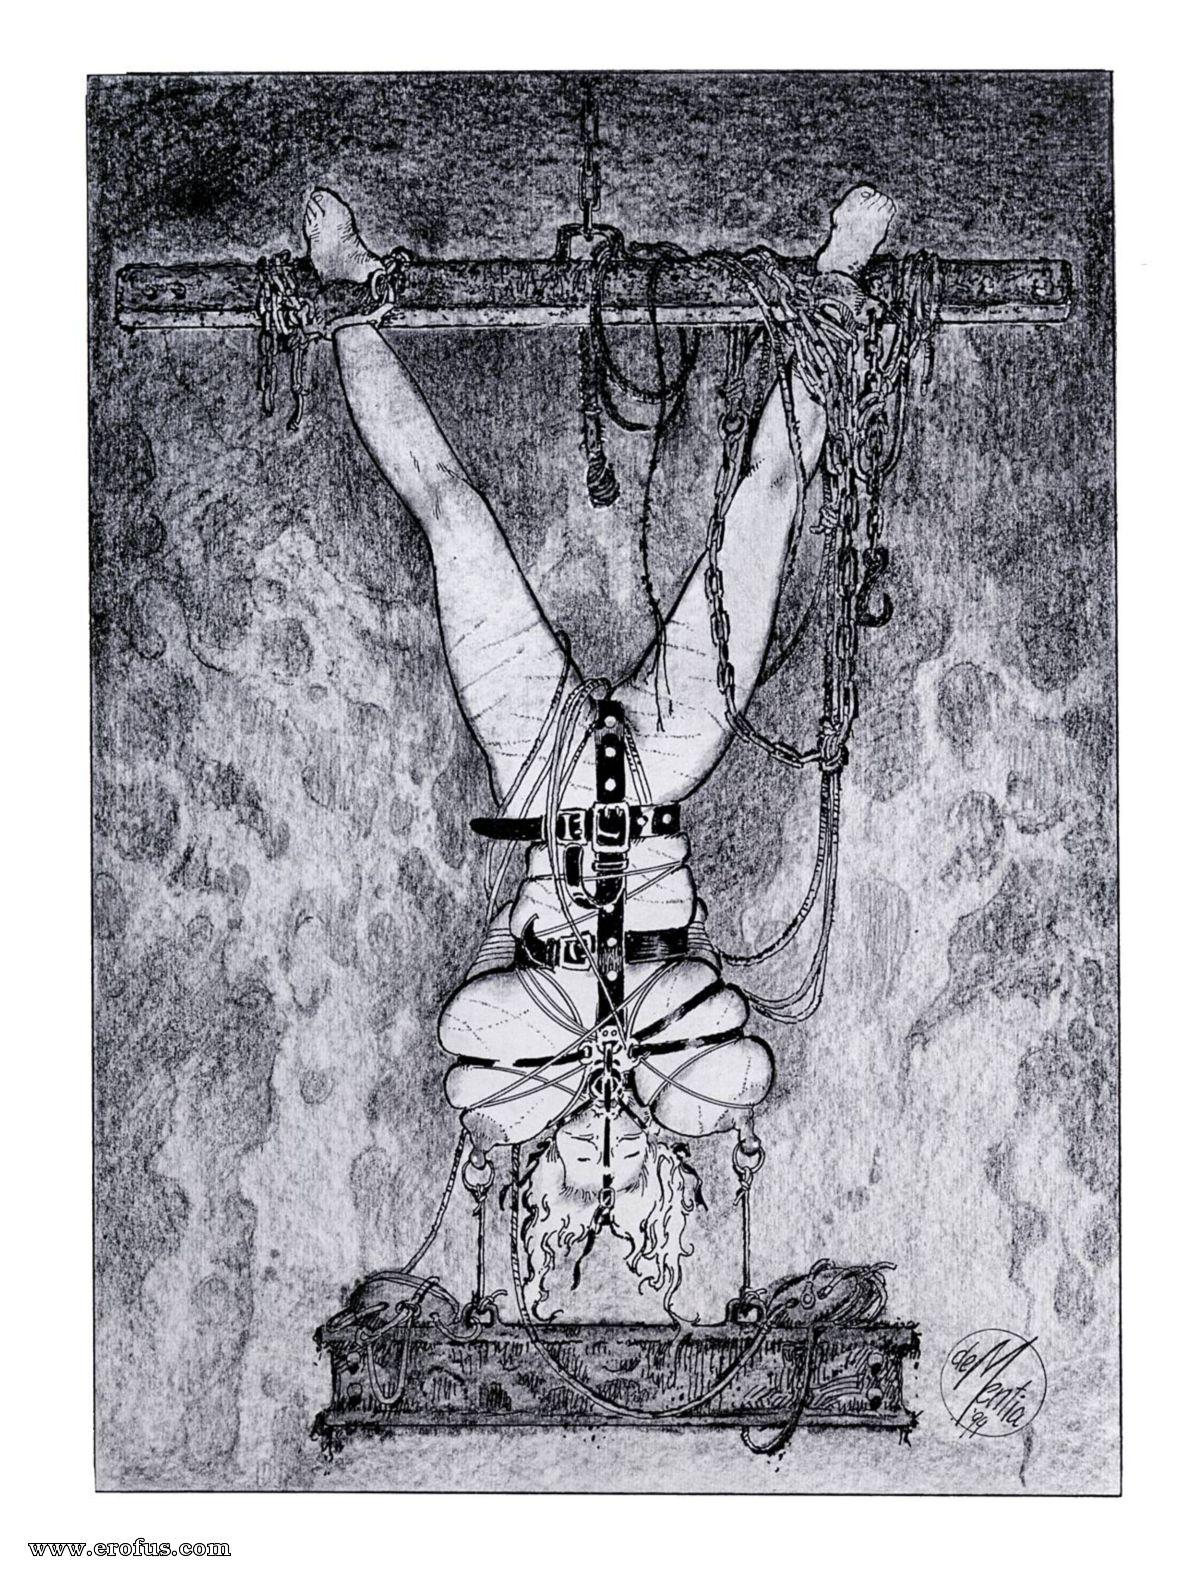 Bizarre bondage